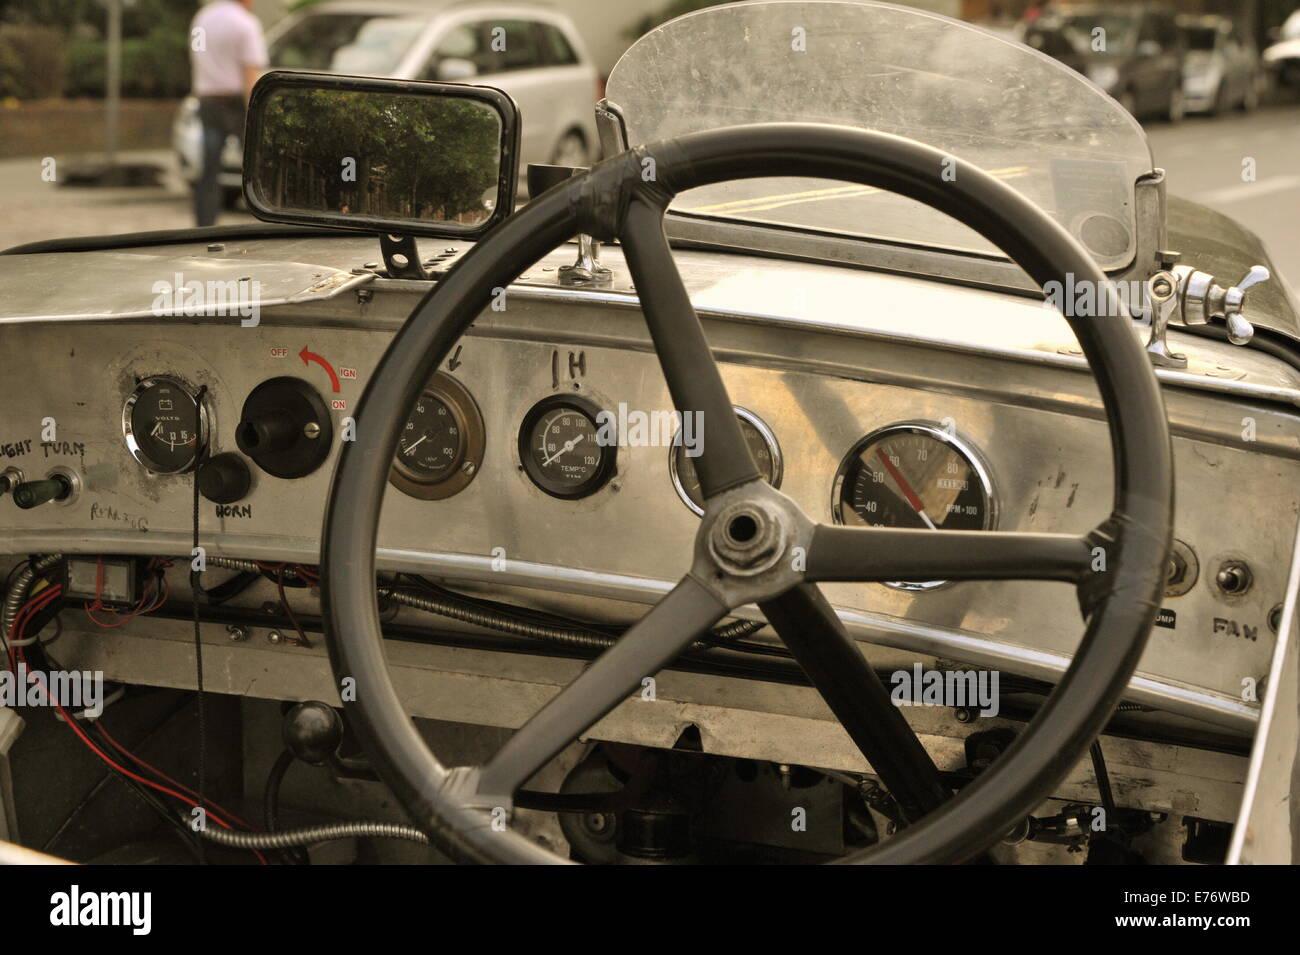 Oldtimer-Cockpit, Hamburg, Deutschland. - Stock Image